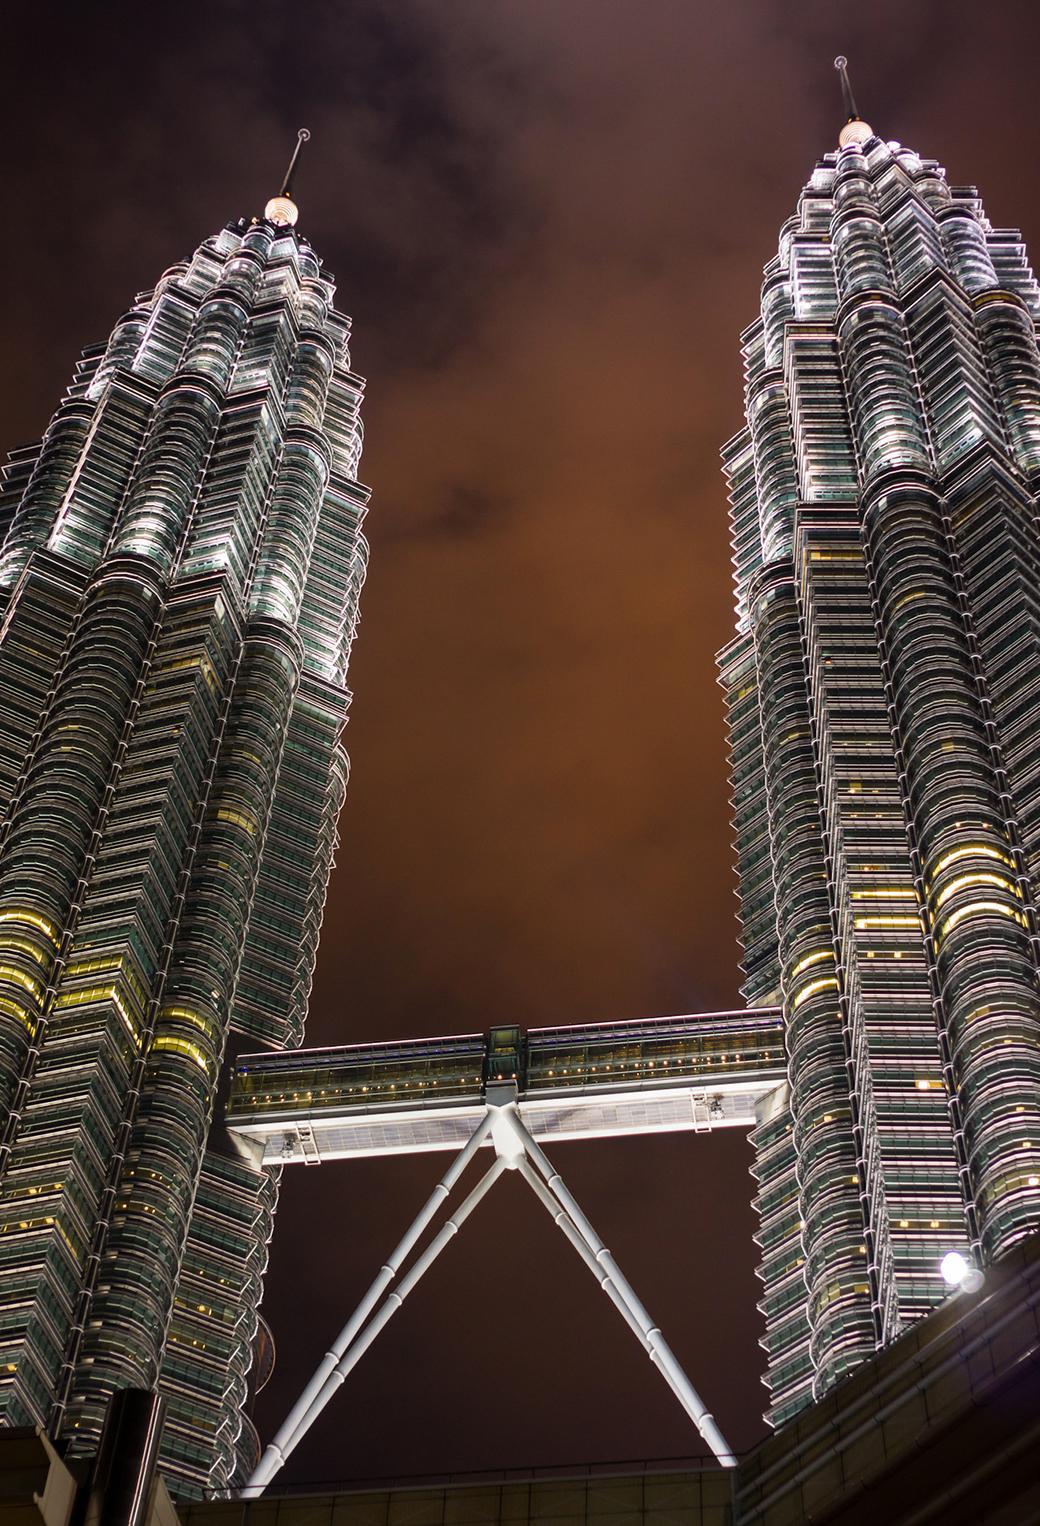 Petronas towers 3Wallpapers Iphone Parallax Pulau Tioman